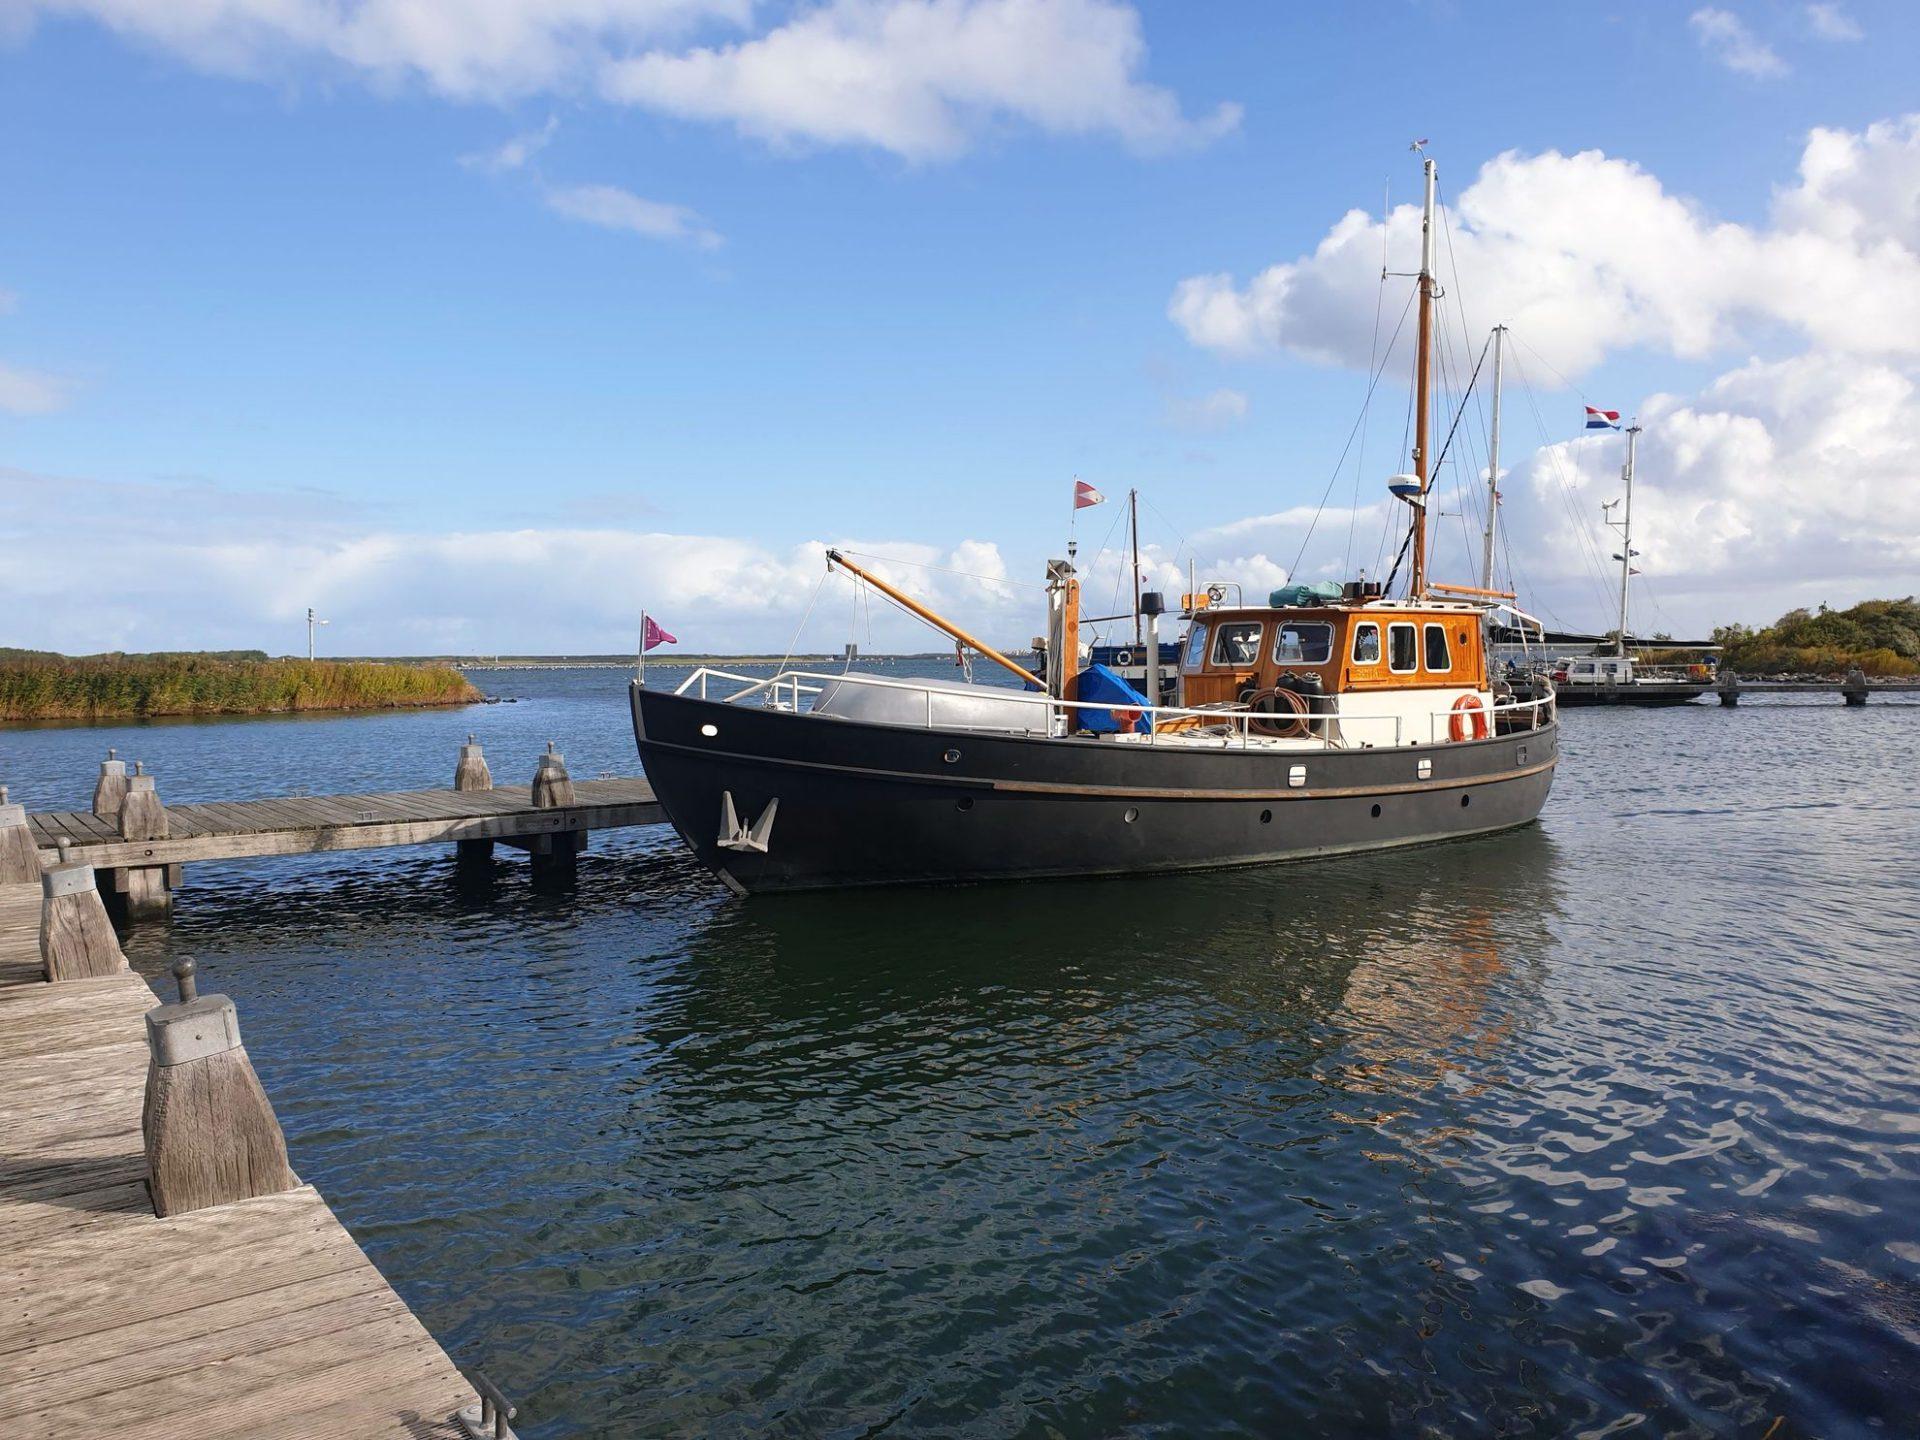 holland-renesse-2019-10-02-11-27-32-sm-g960f-17-1920x1440.jpg